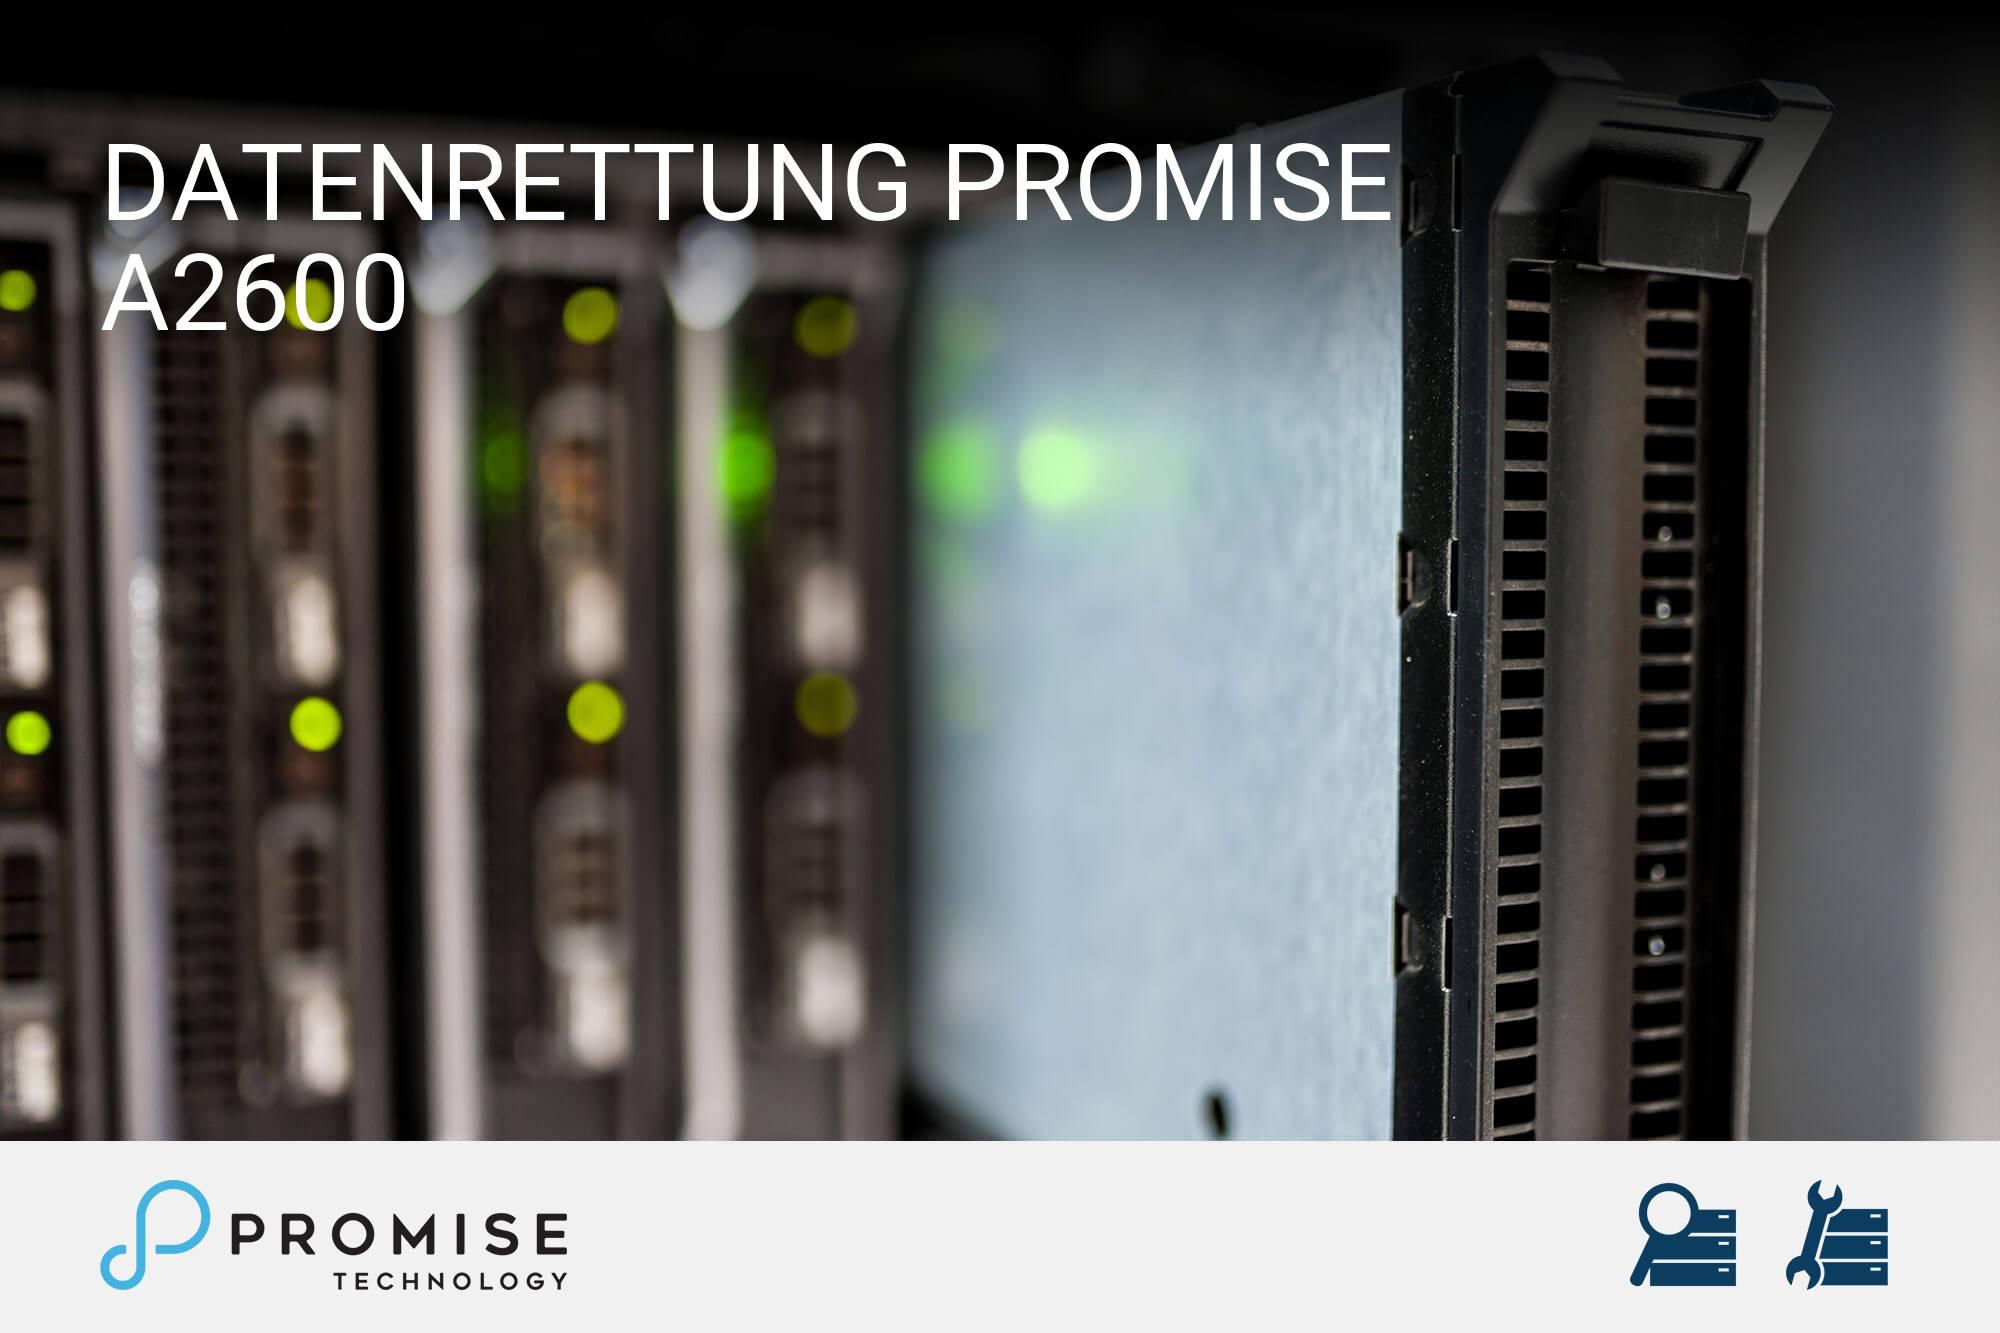 Promise A2600